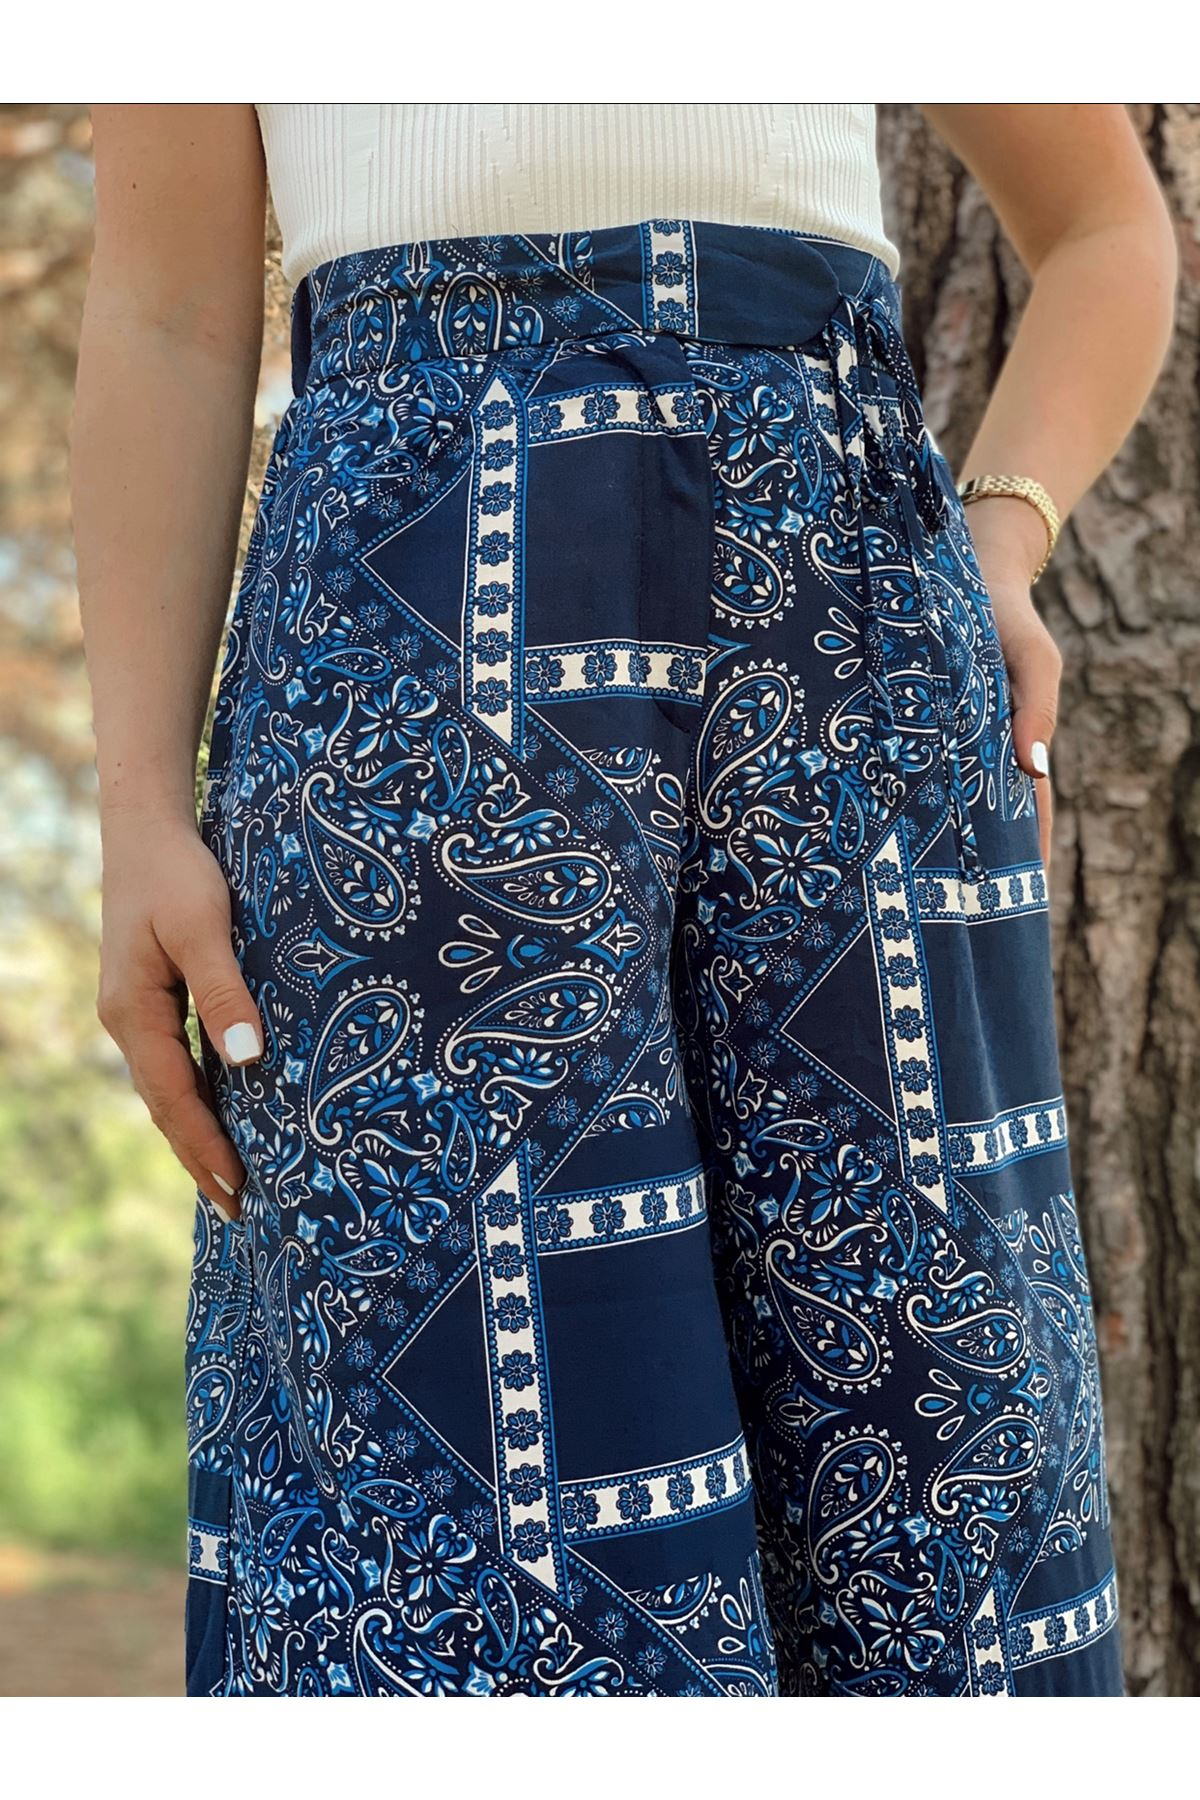 Etnik desen salaş lacivert pantolon